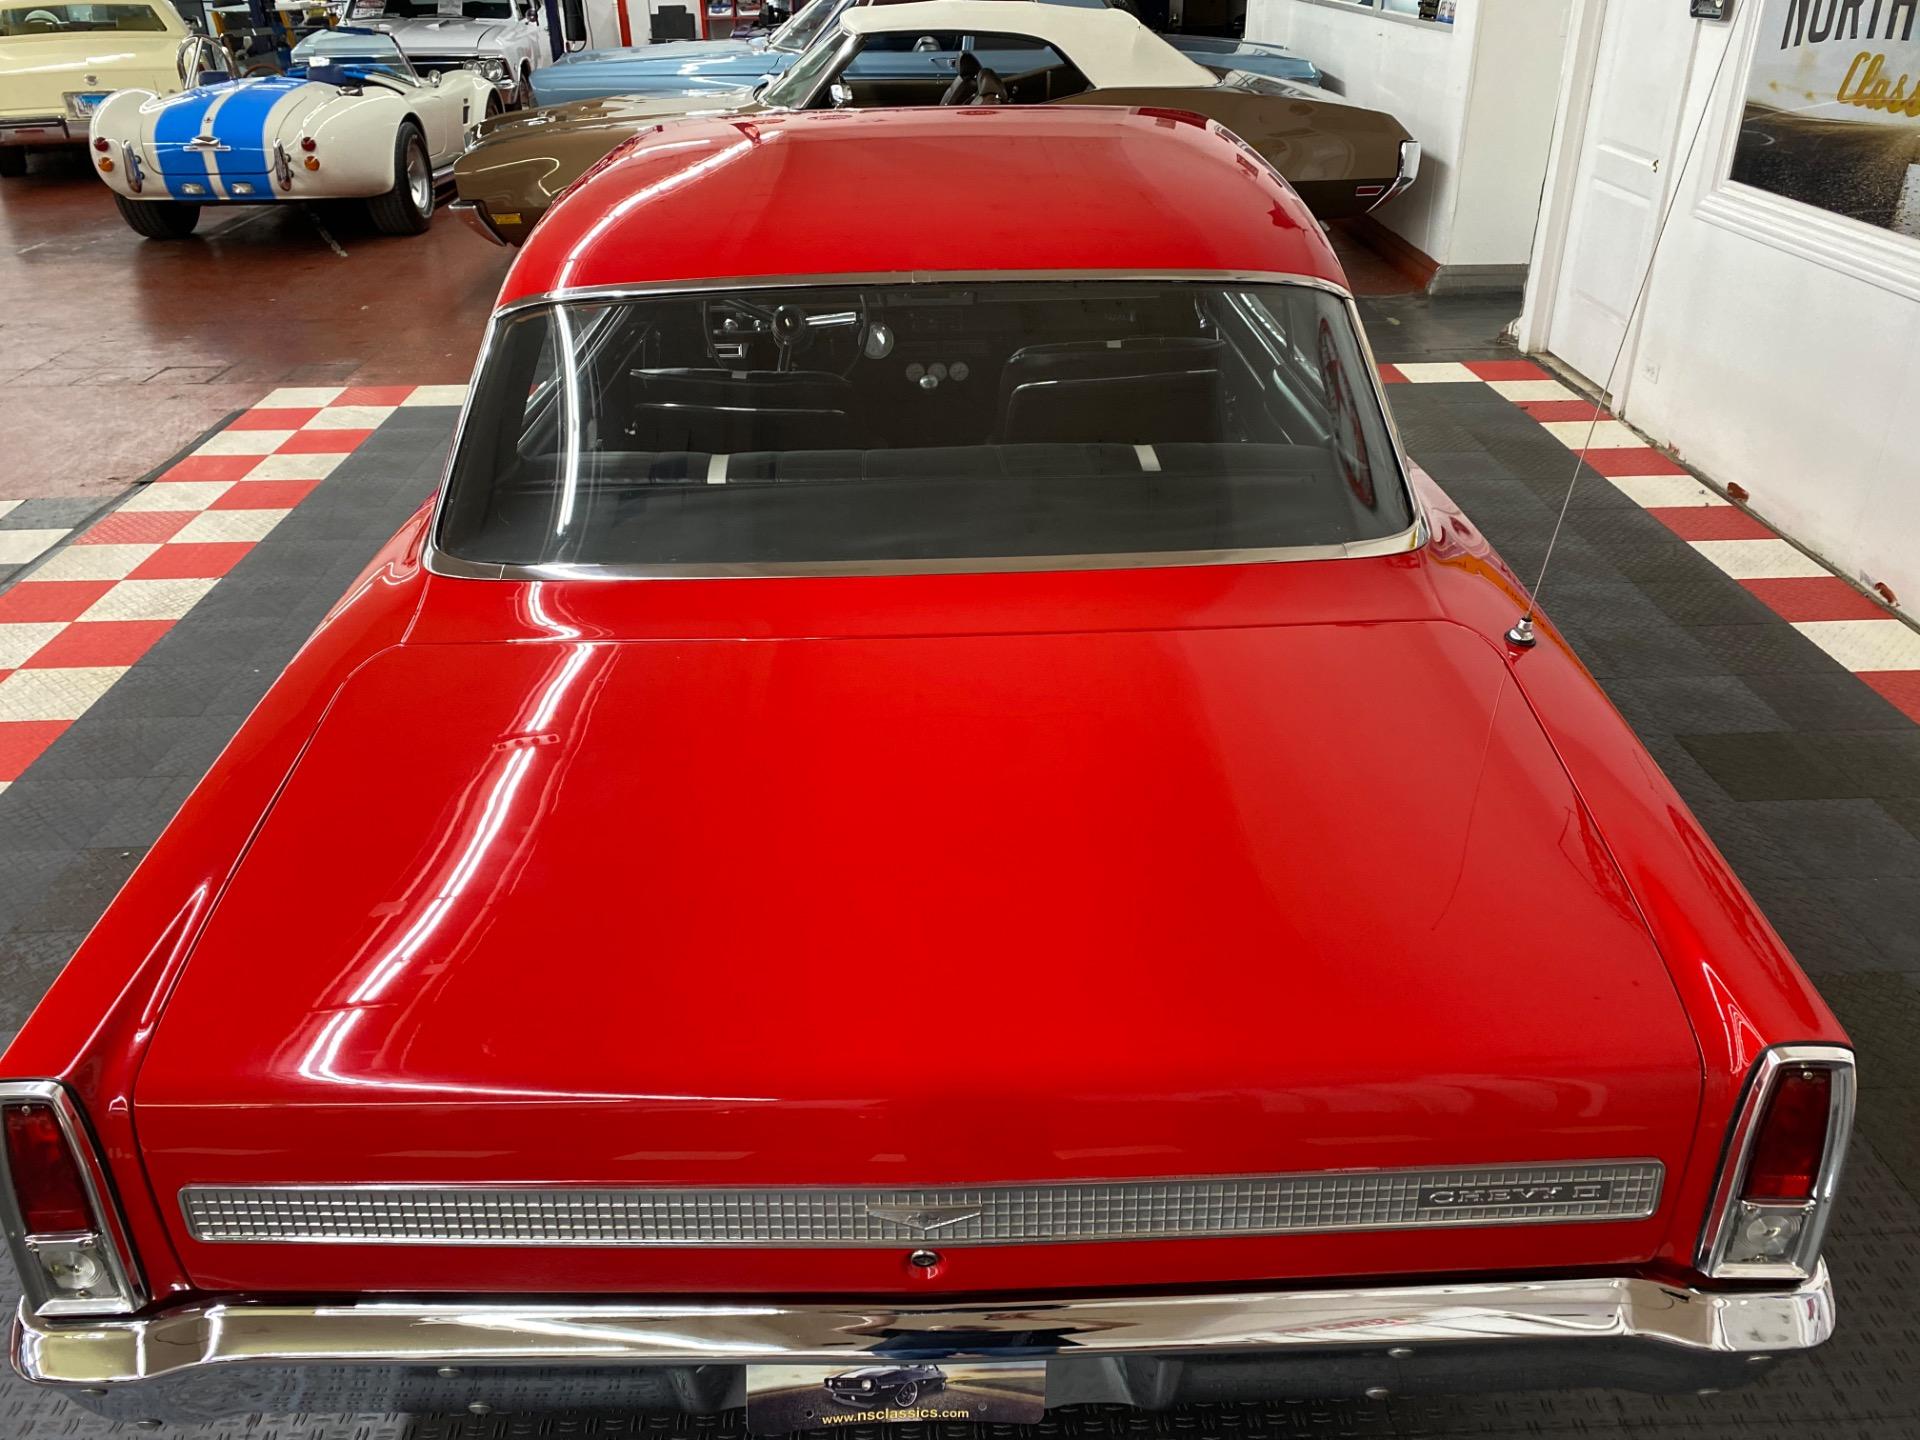 Used 1967 Chevrolet Nova - RESTO MOD - 350 CRATE ENGINE - VINTAGE A/C - | Mundelein, IL